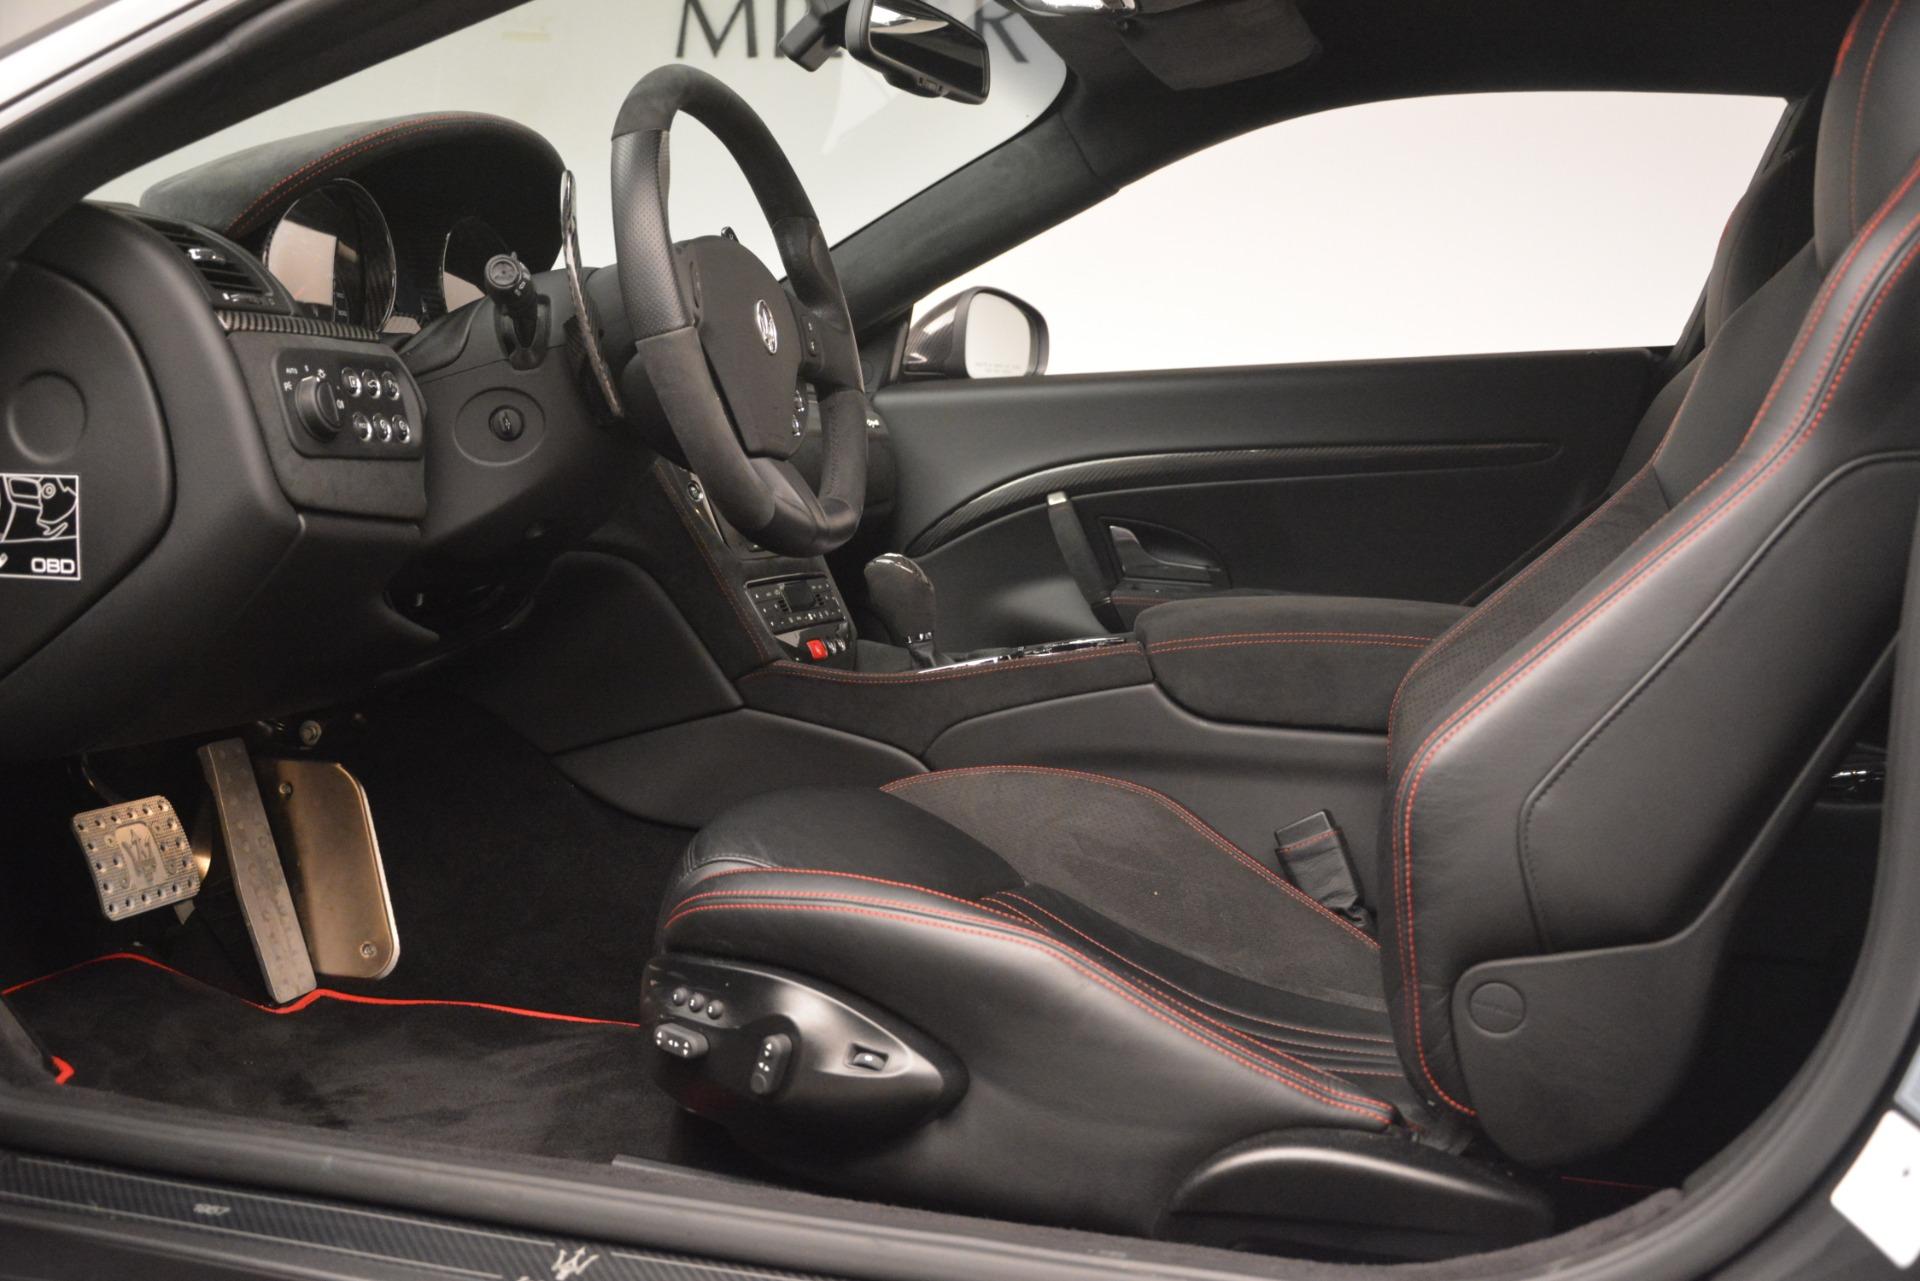 Used 2017 Maserati GranTurismo GT Sport Special Edition For Sale In Greenwich, CT 665_p14